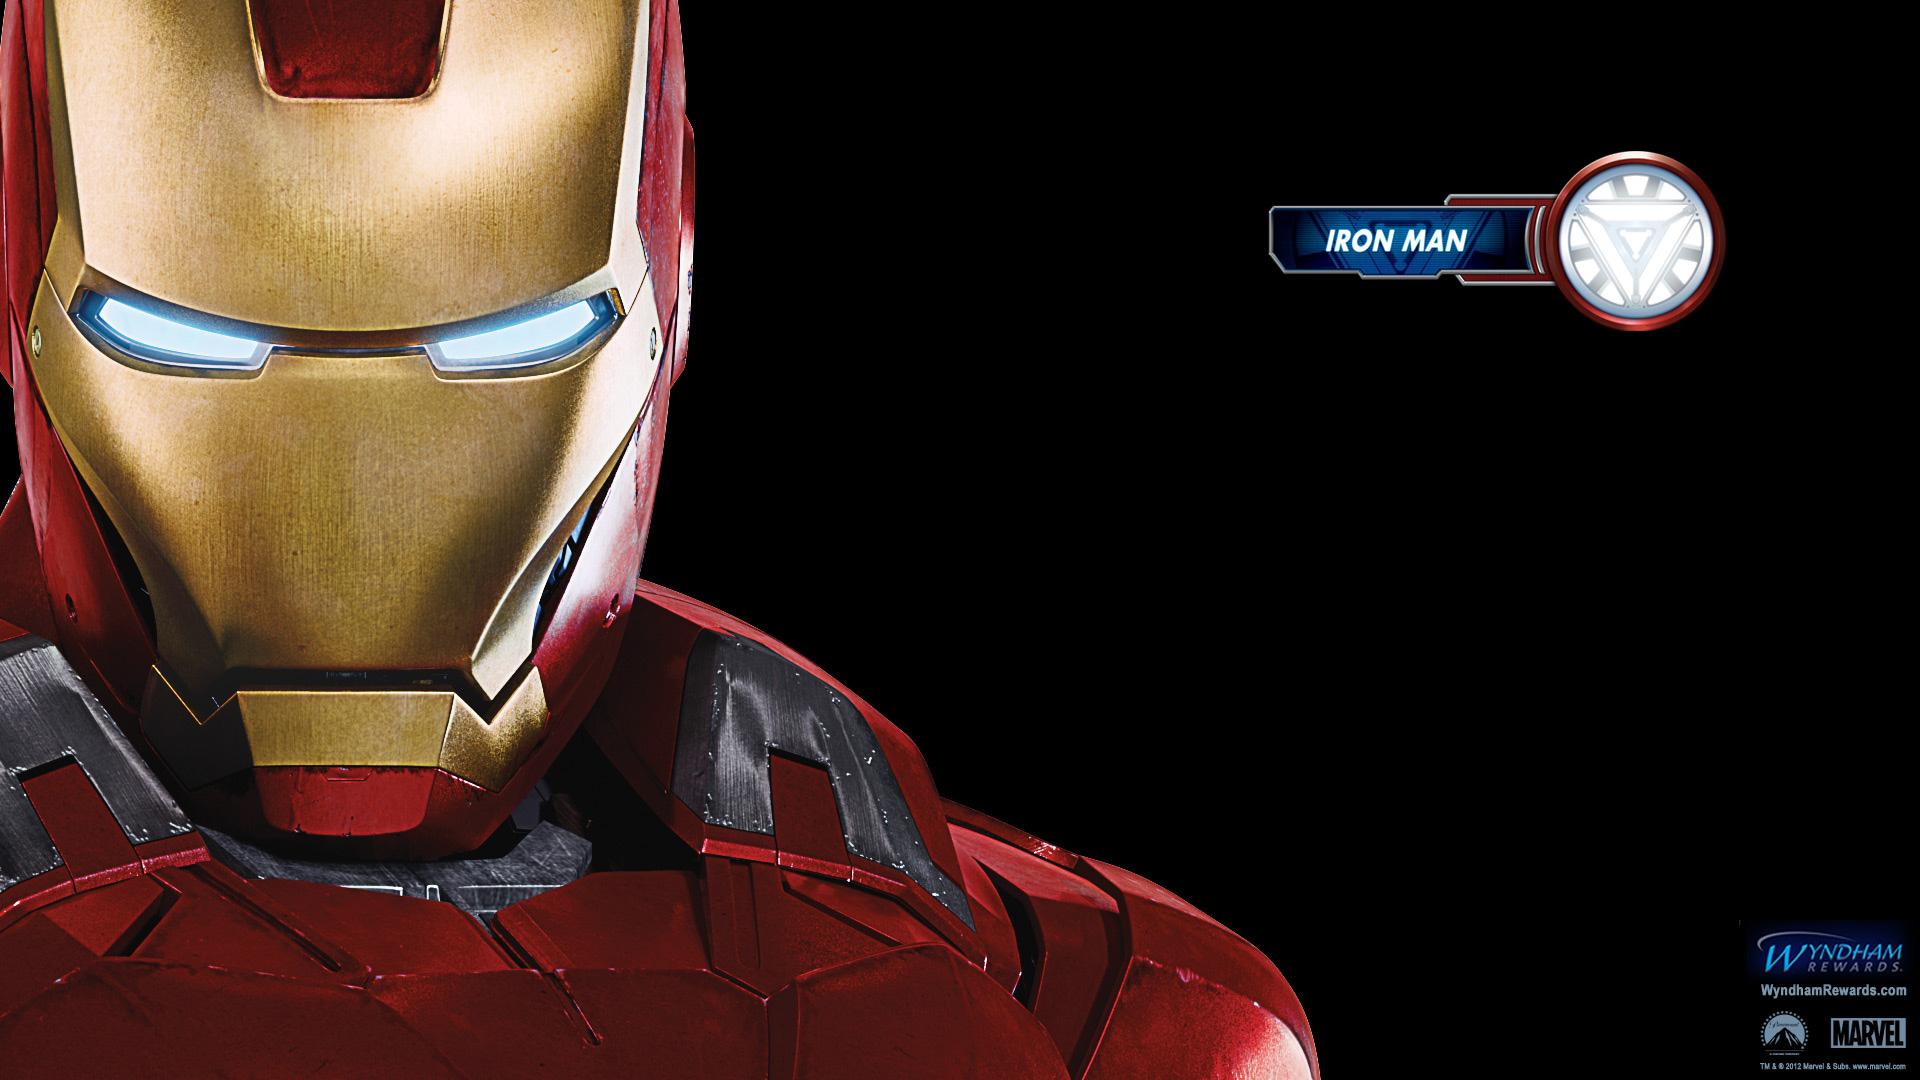 Iron Man 1080p Full HD Wallpapers download 1080p desktop 1920x1080